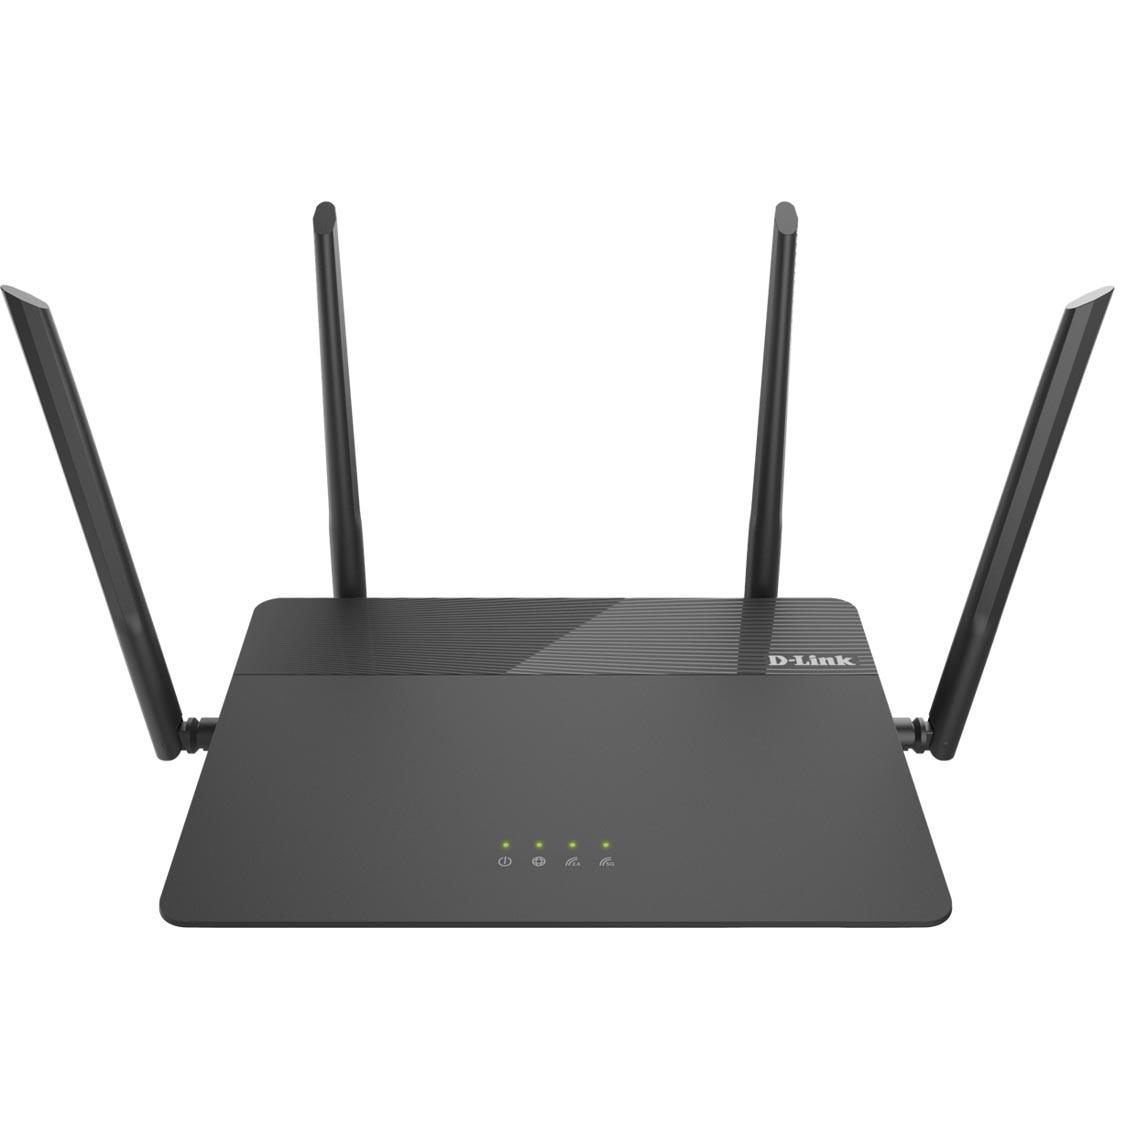 Fotografie Router D-Link DIR-878, 4 port-uri wireless AC1900, Dual-Band, Gigabit